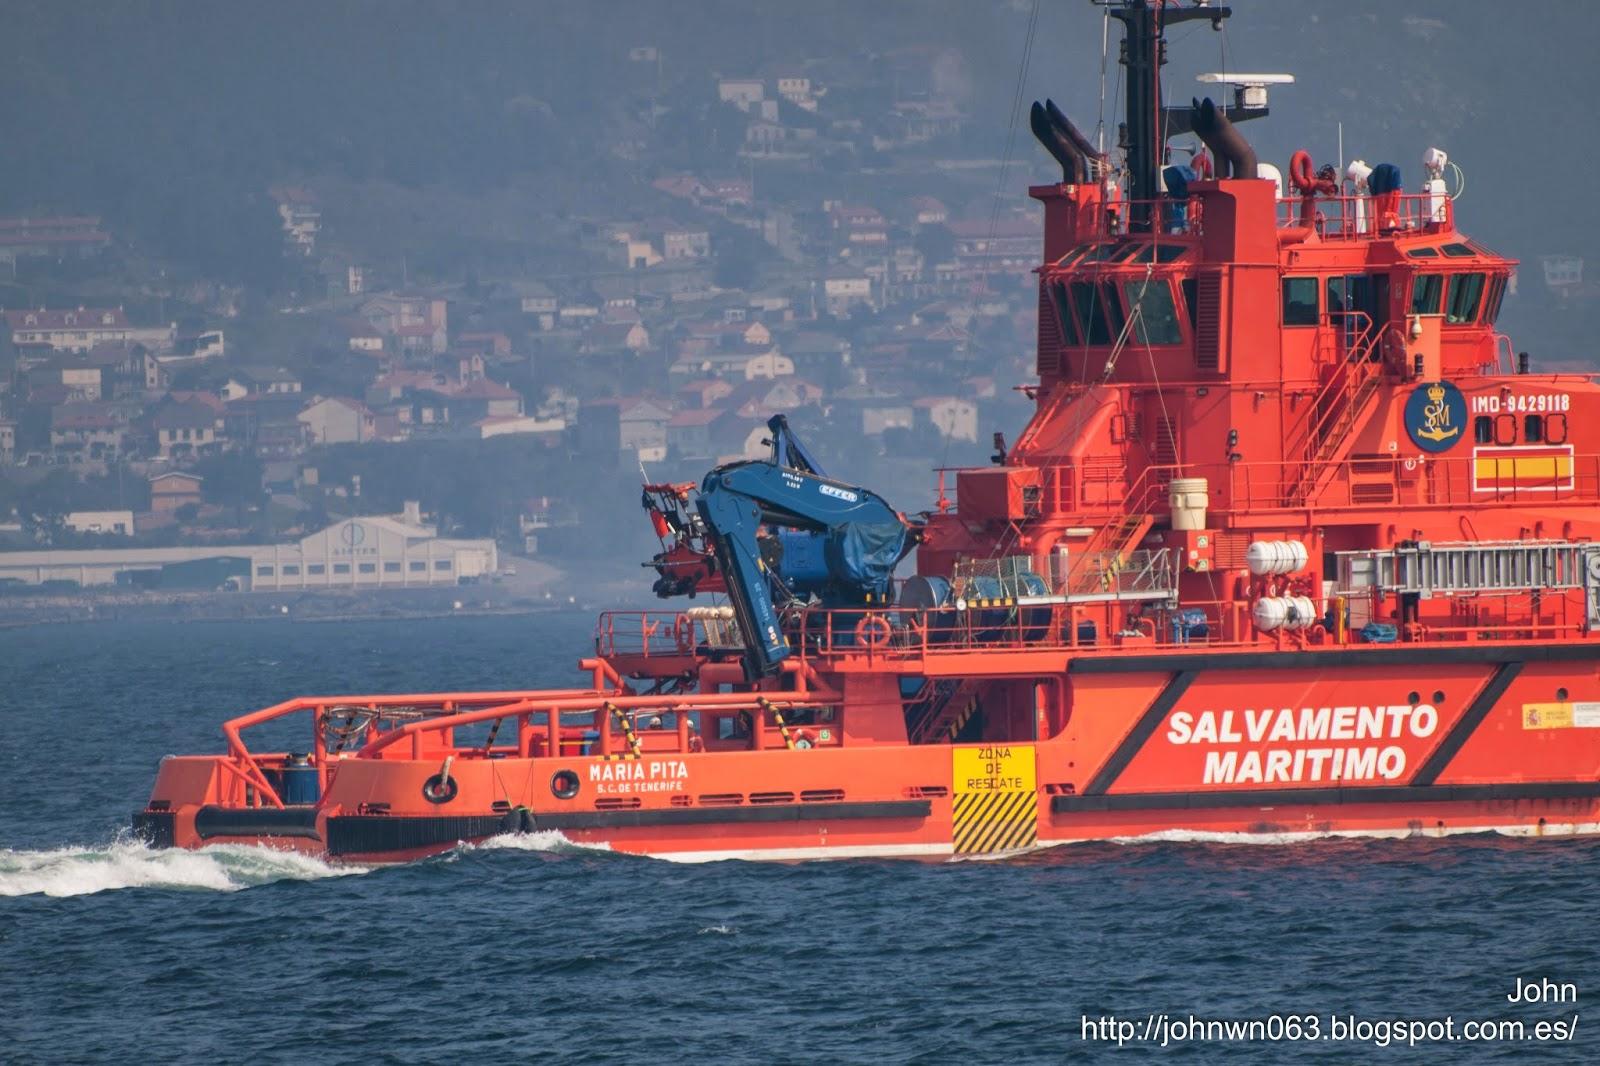 fotos de barcos, maria pita, salvamento marítimo, remolcador, vigo, imagenes de barcos